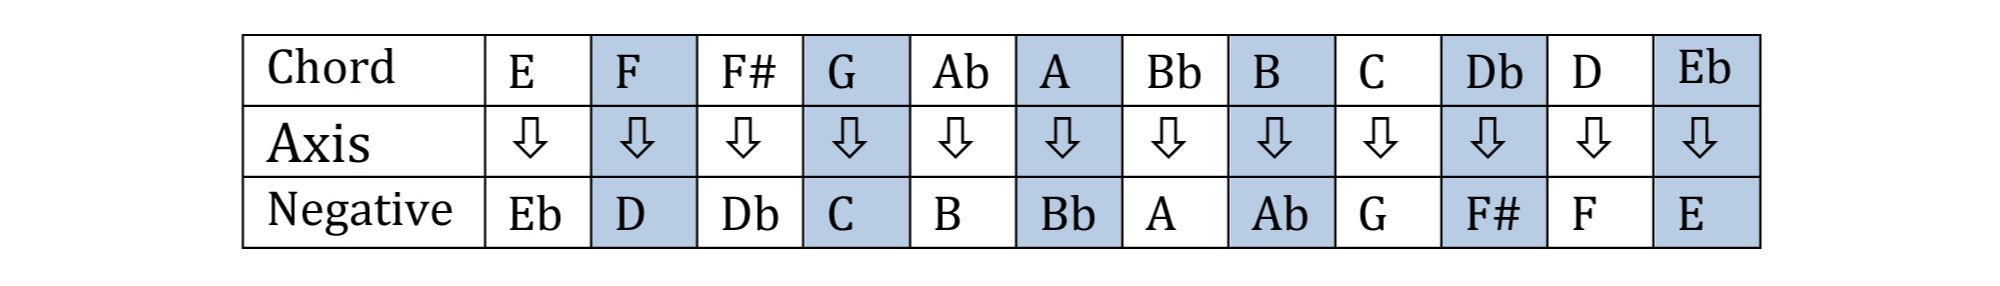 Negative Harmony Chart C